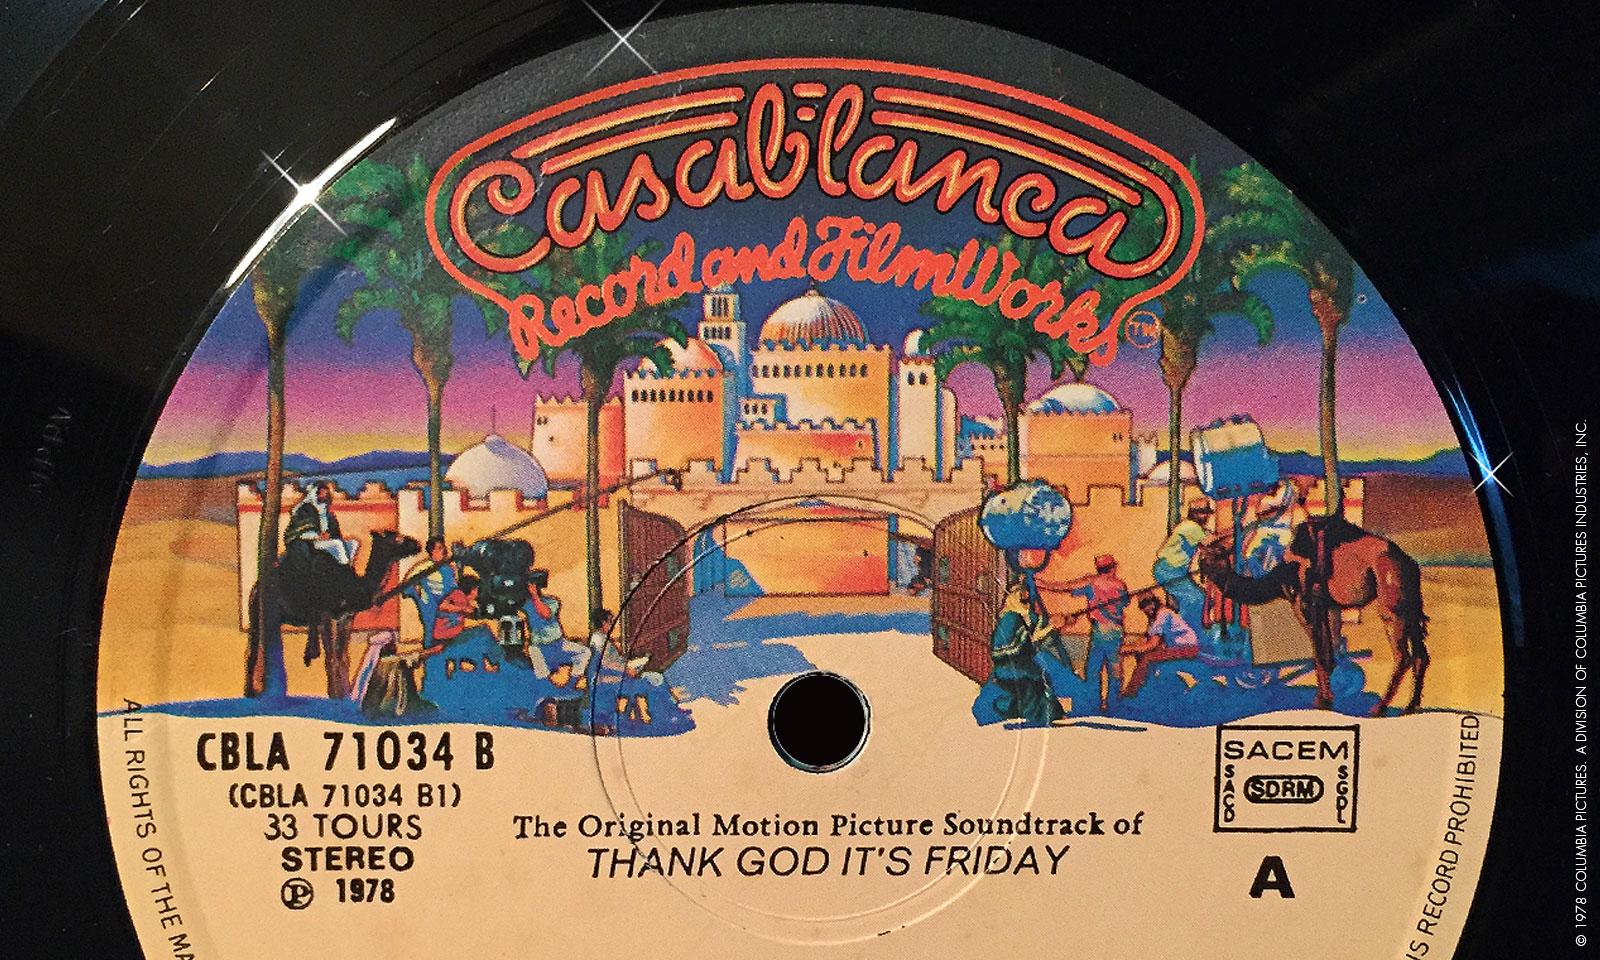 ORIGINAL LP FROM 1978